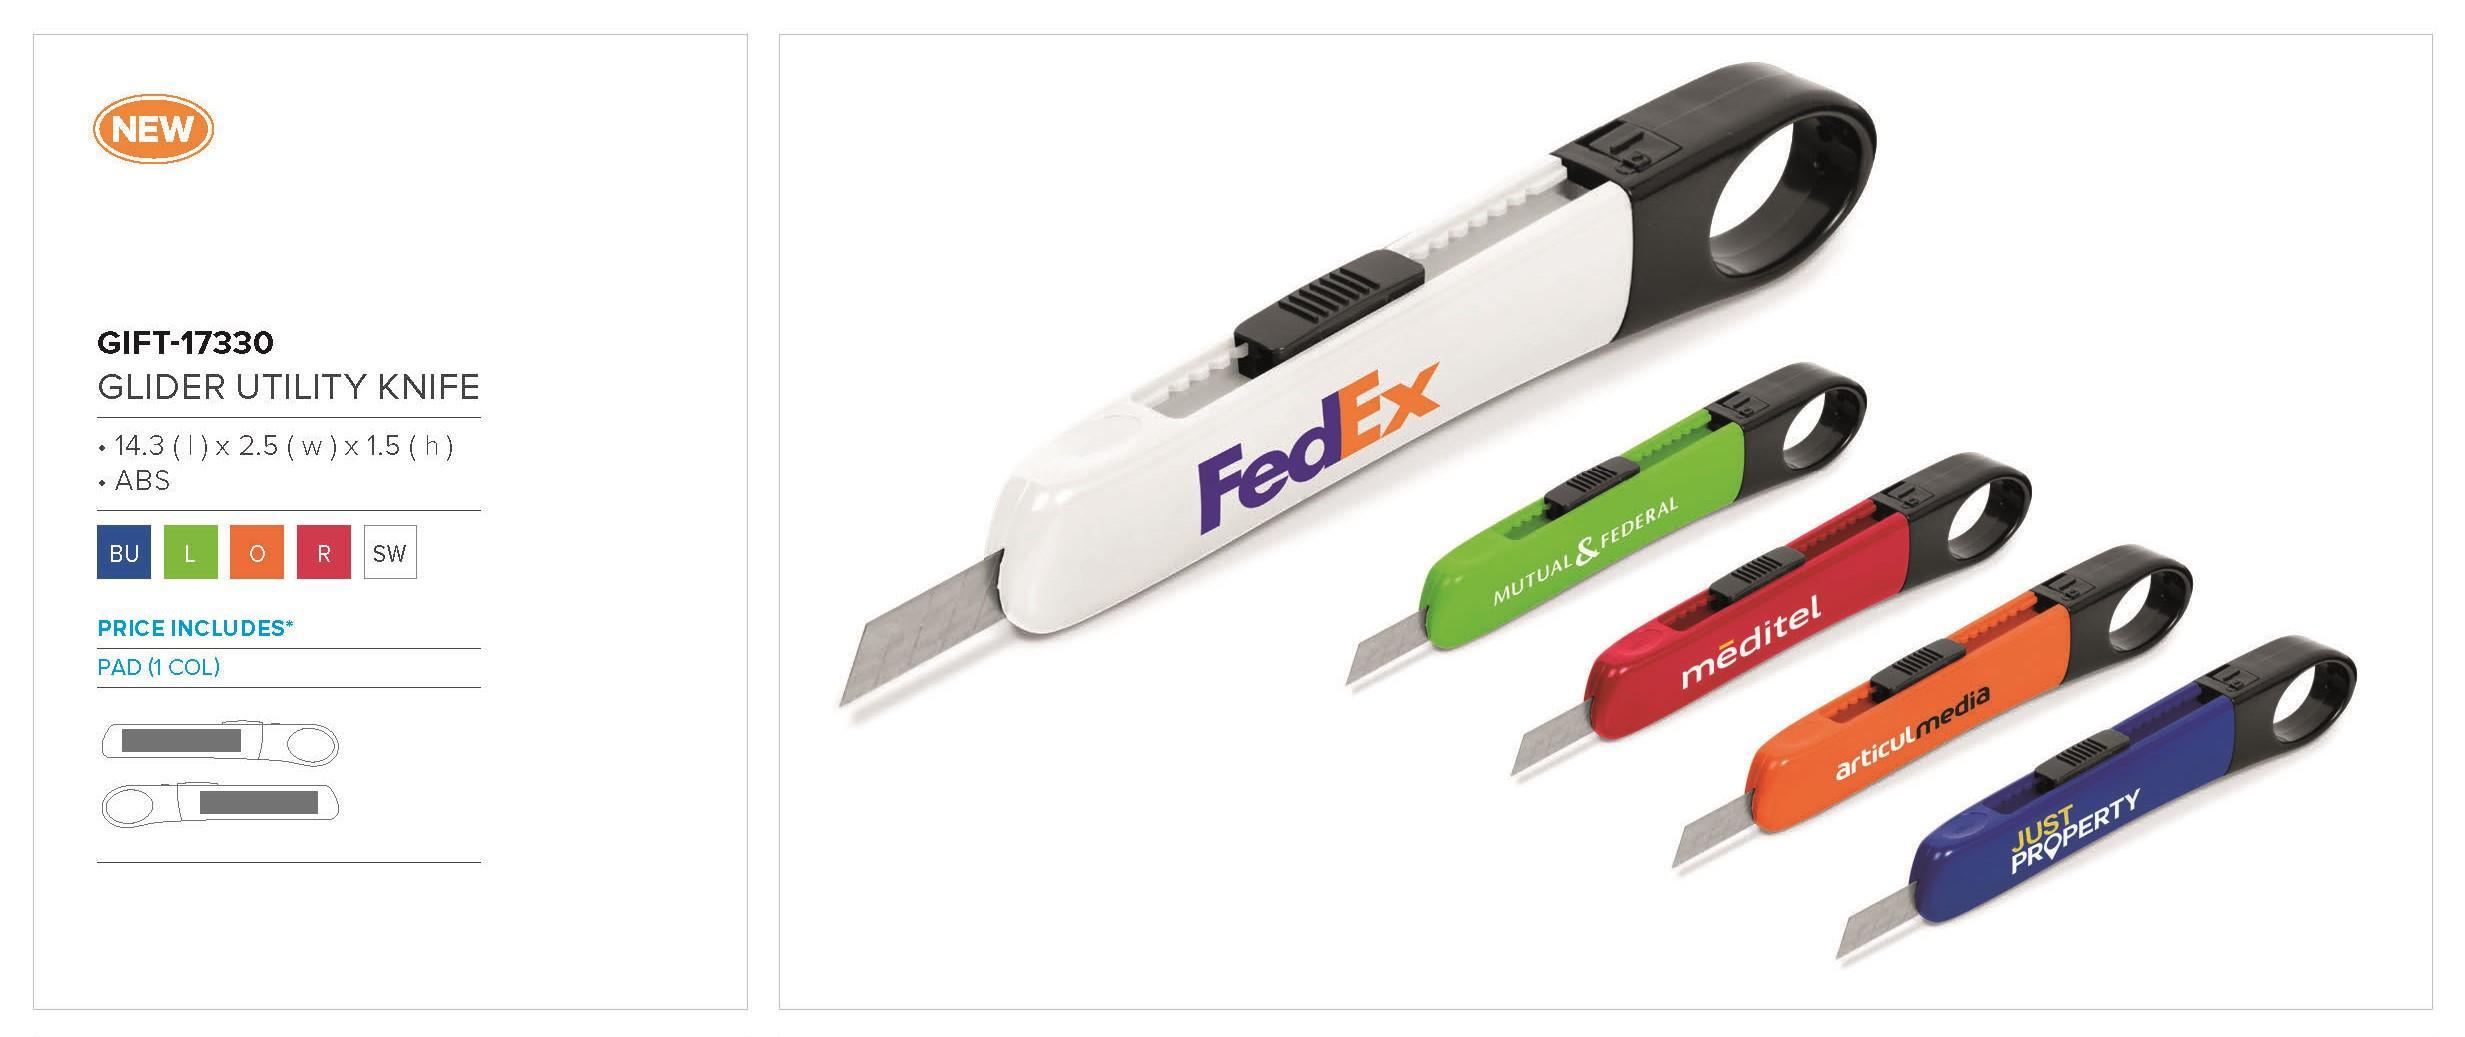 Glider Utility Knife